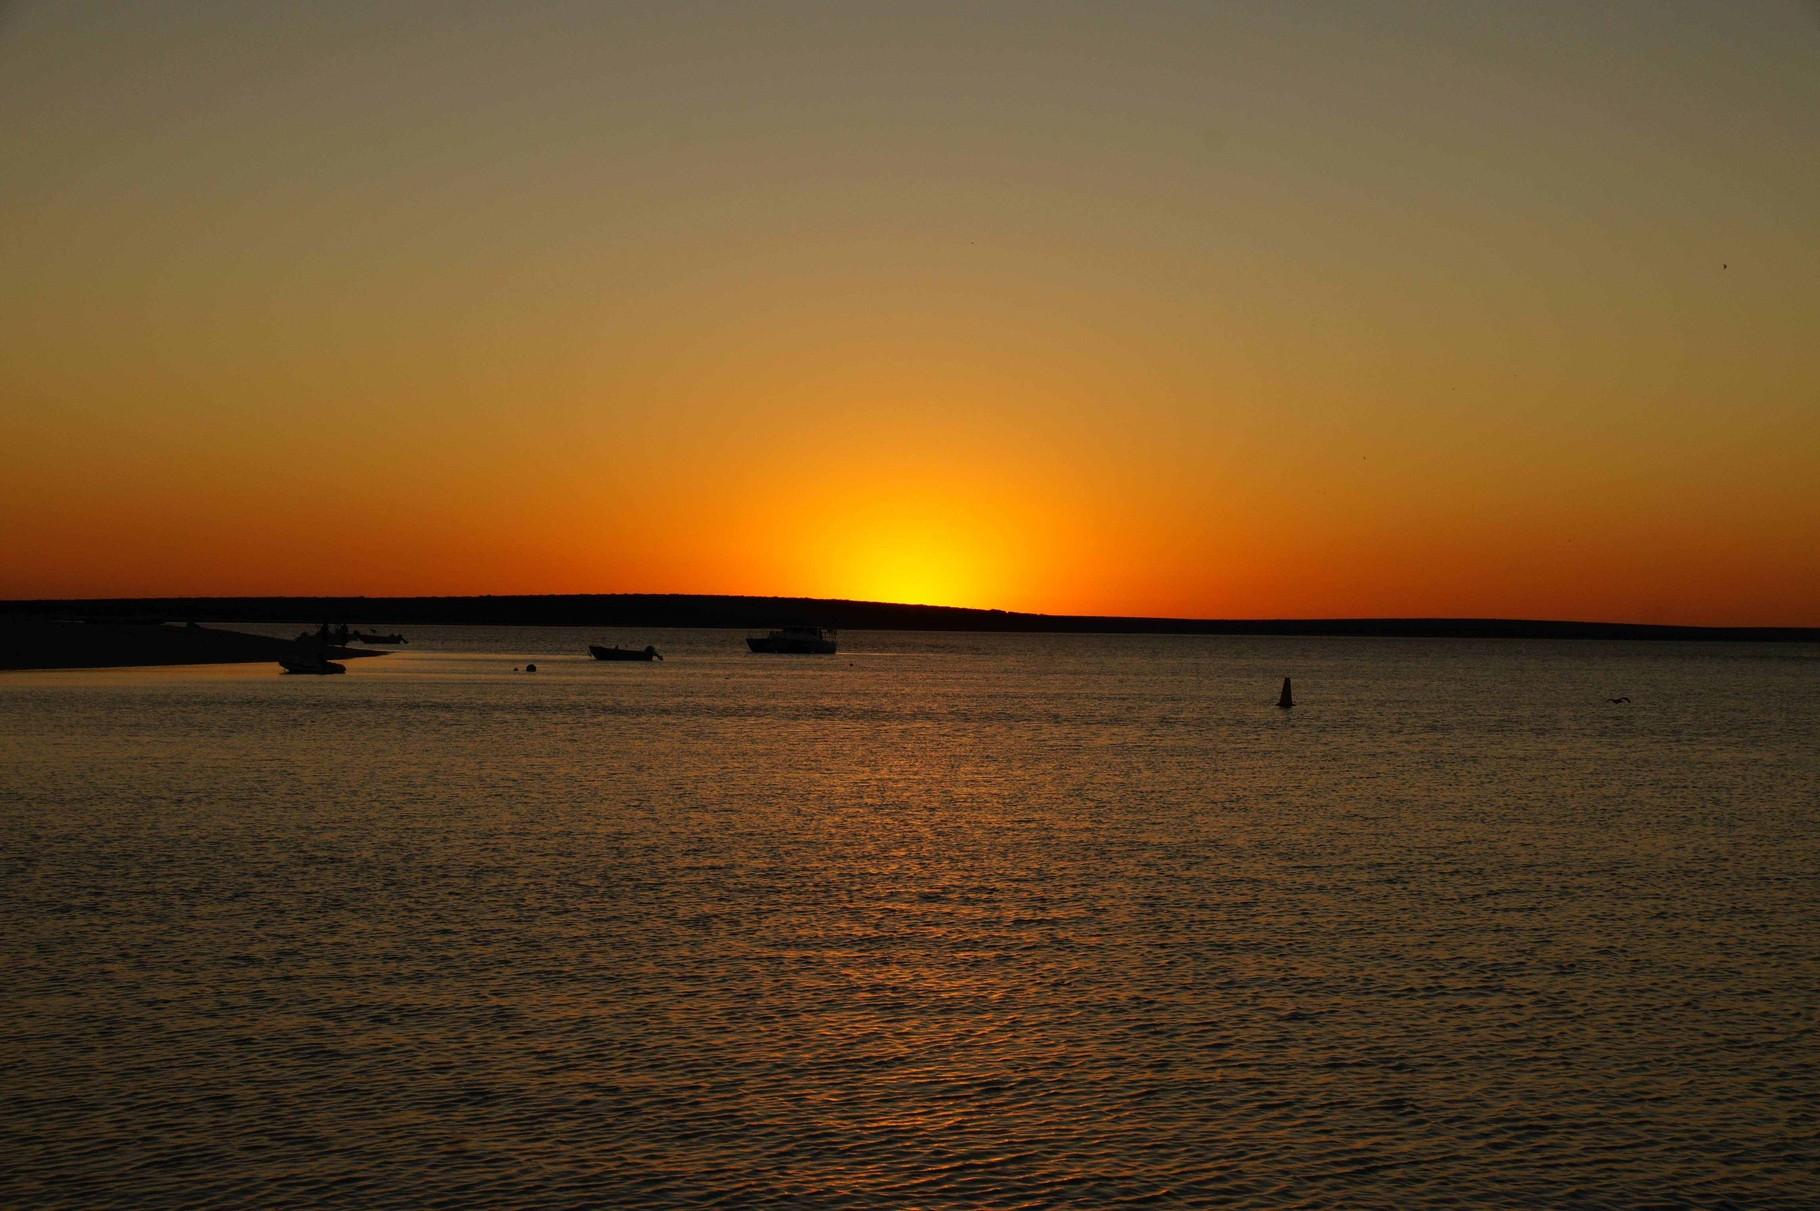 Sonnenuntergang in Mokey Mia, WA